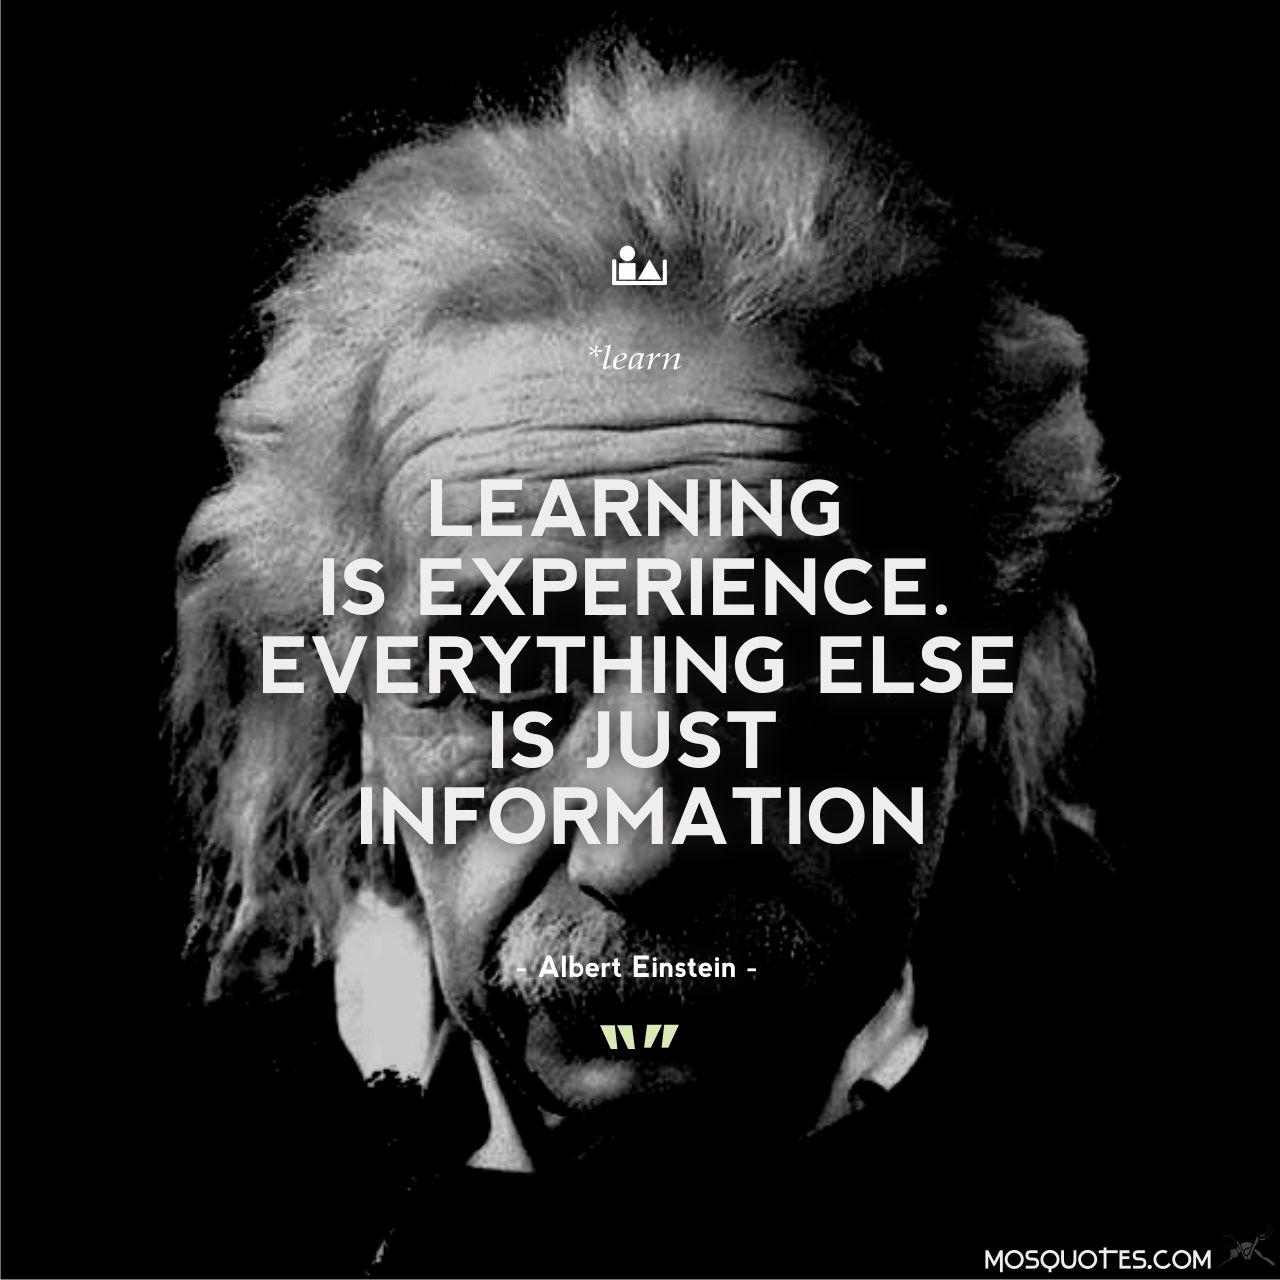 Albert Einstein Quotes: Famous Quotations on Religion ...